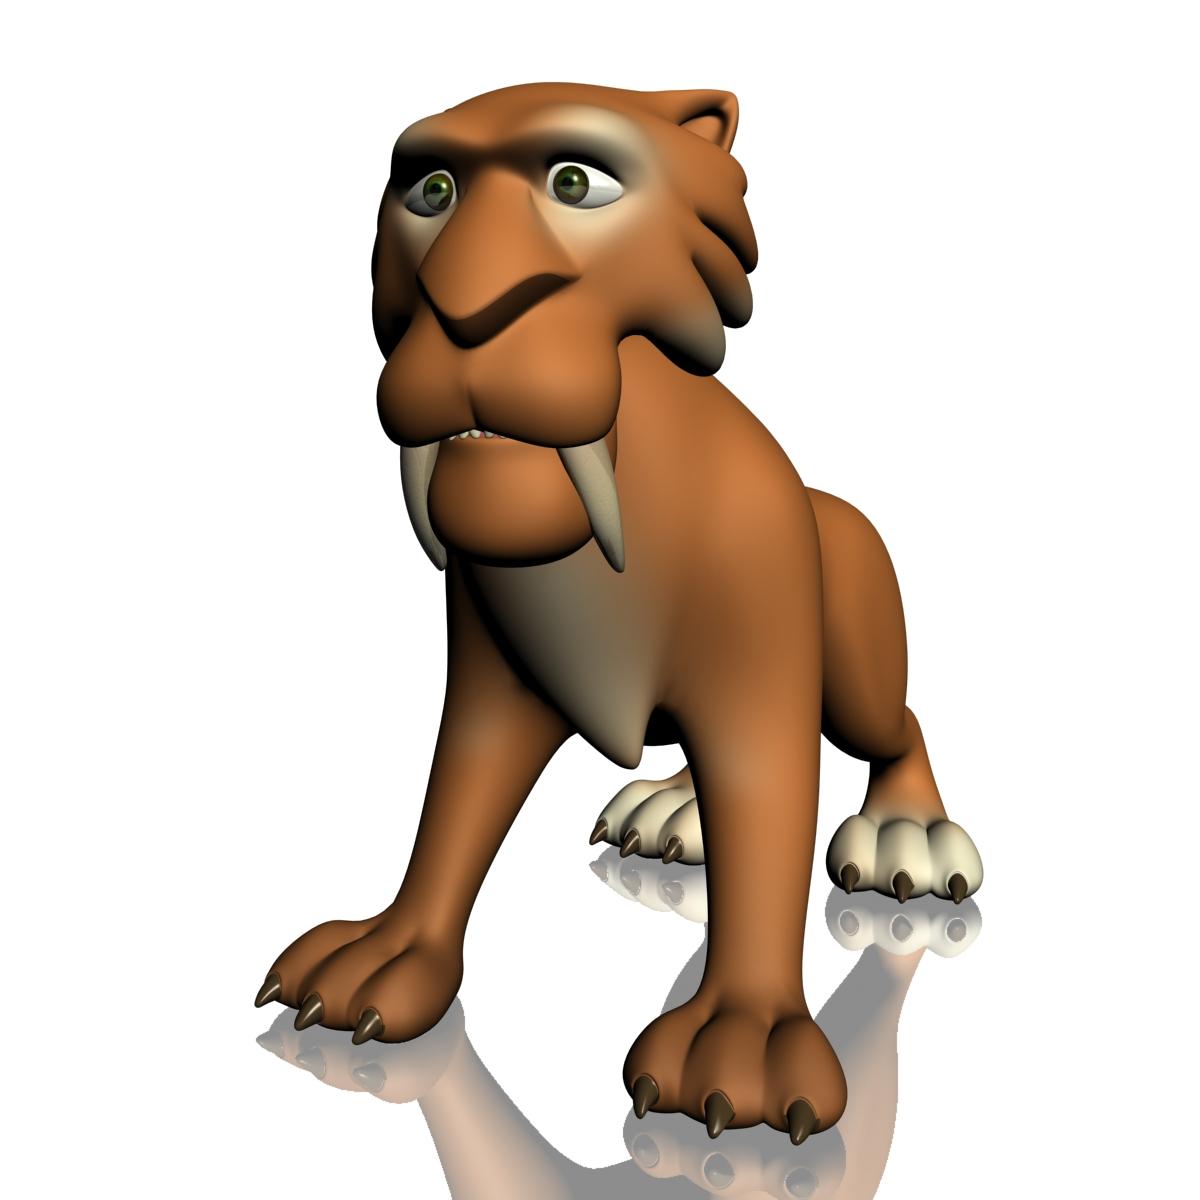 cartoon sabertooth tiger rigged 3d model 3ds max fbx  obj 214100